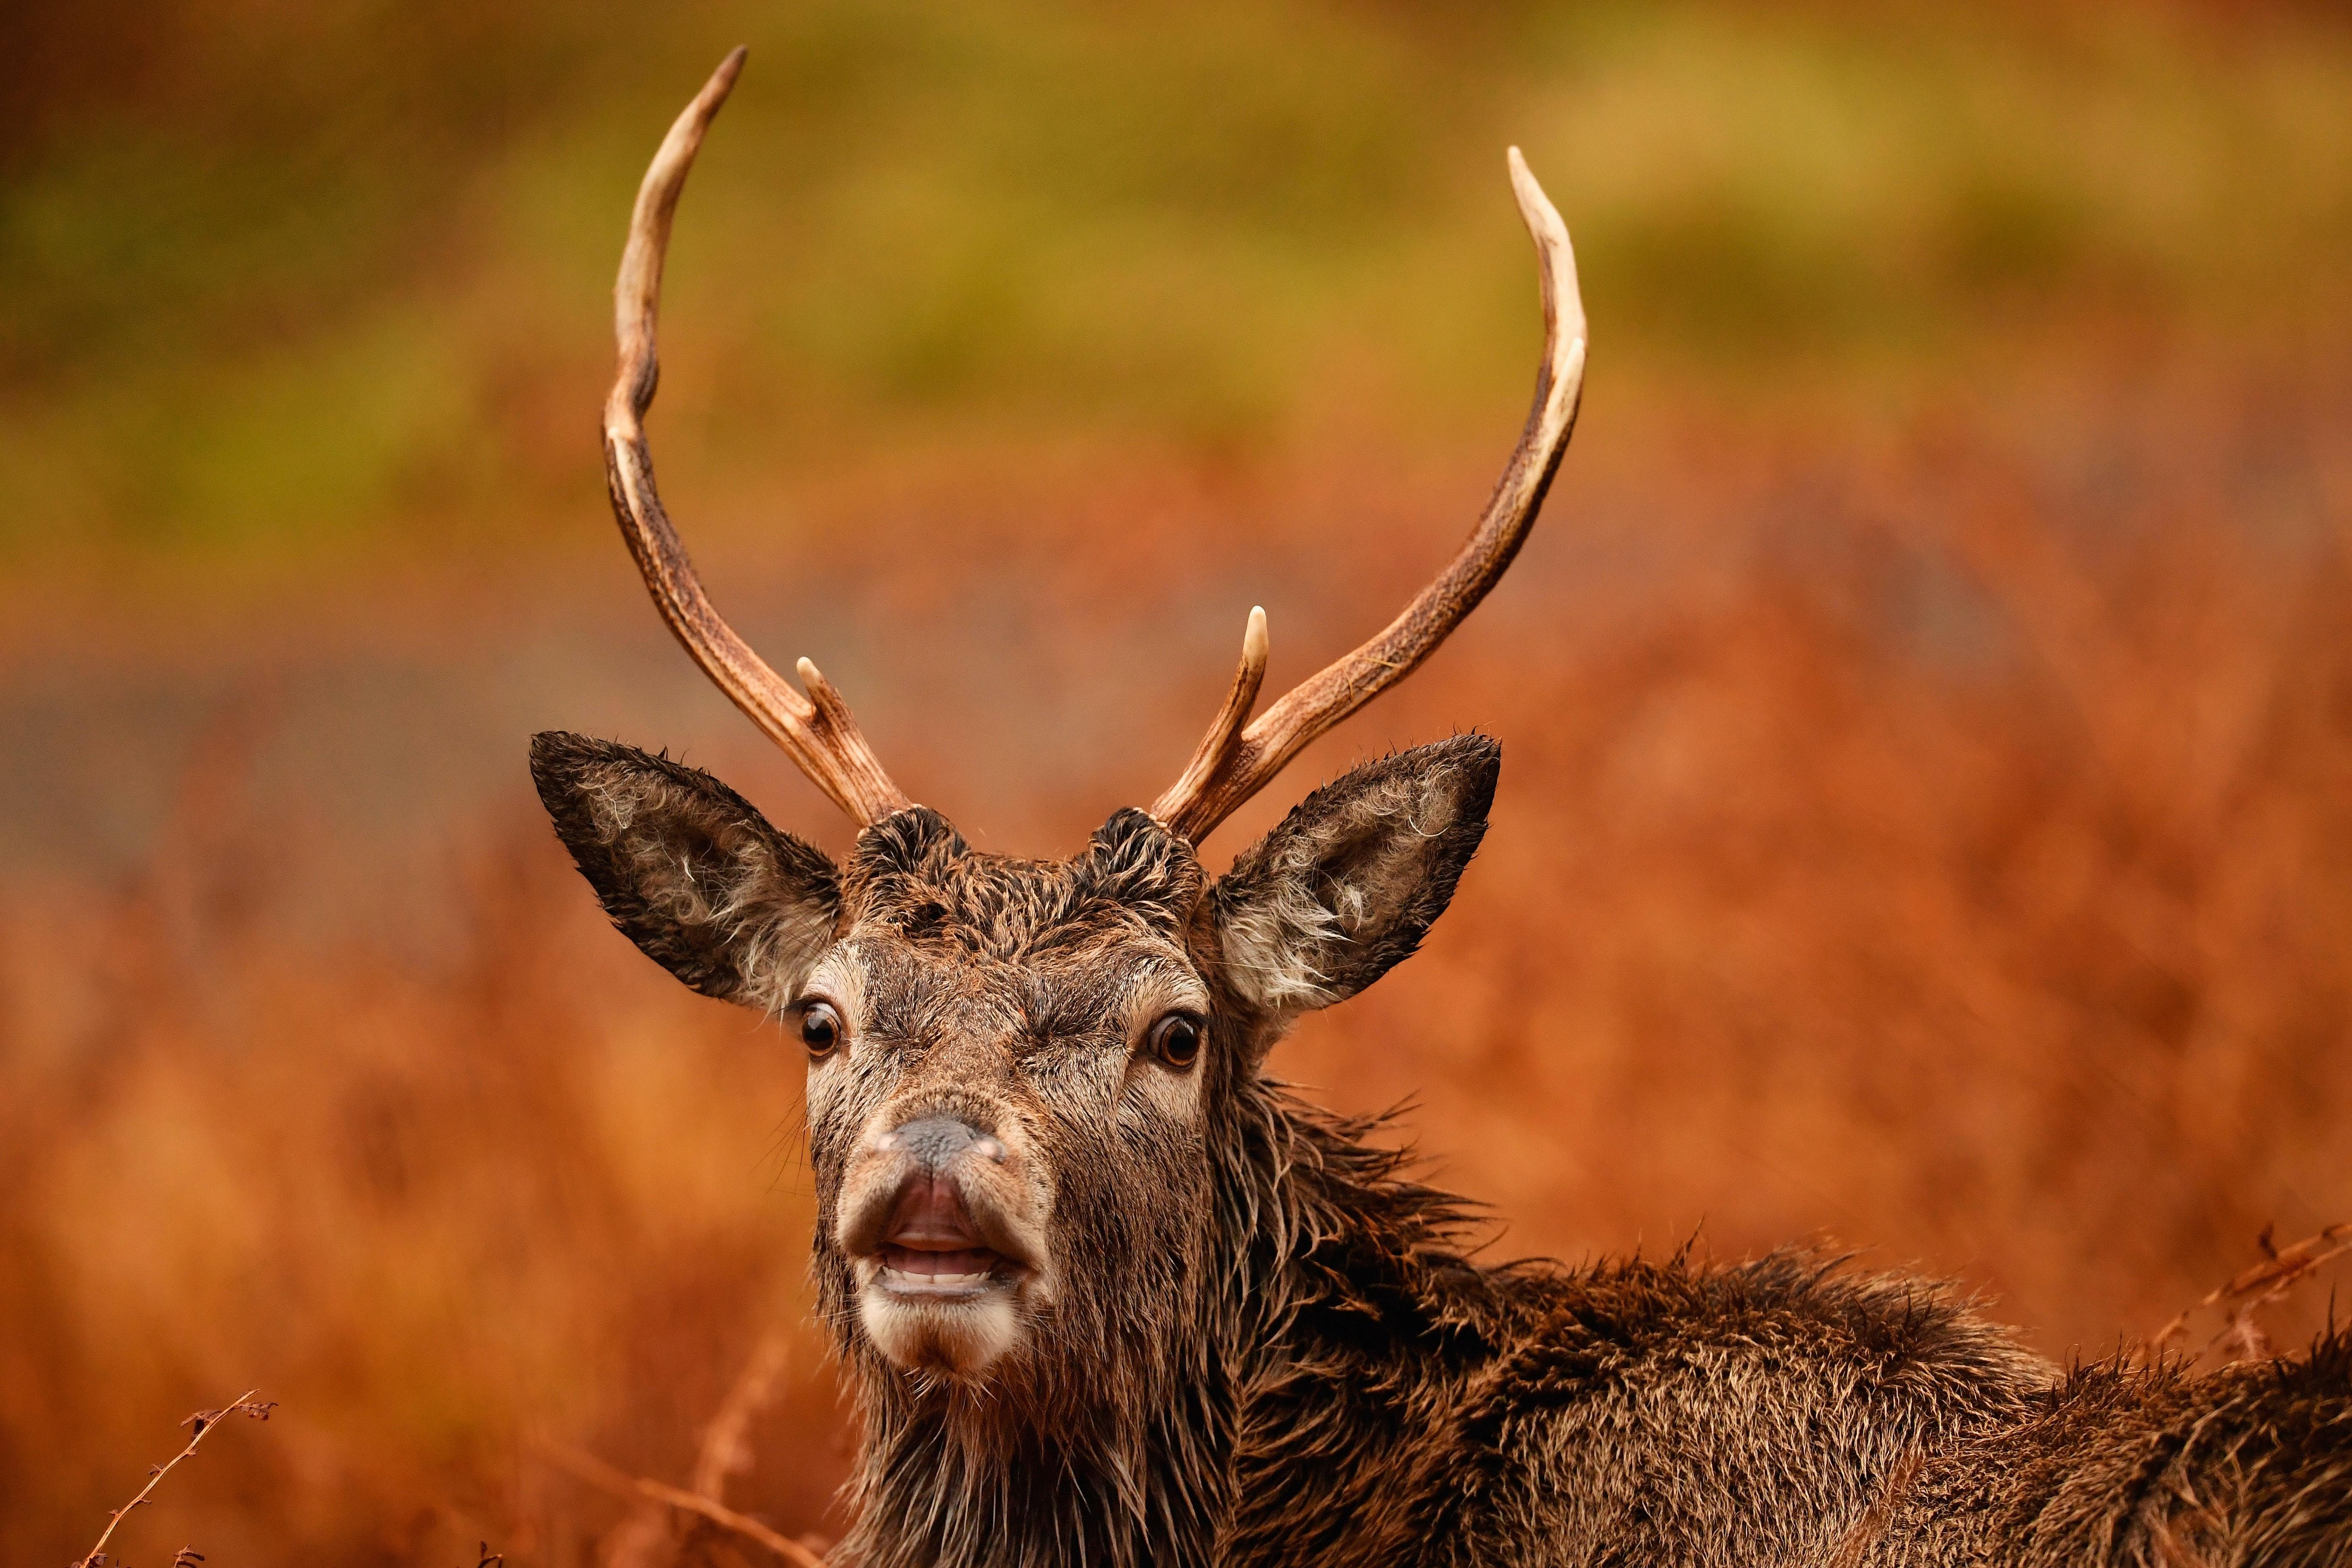 Mites Elk - a dangerous deer parasite